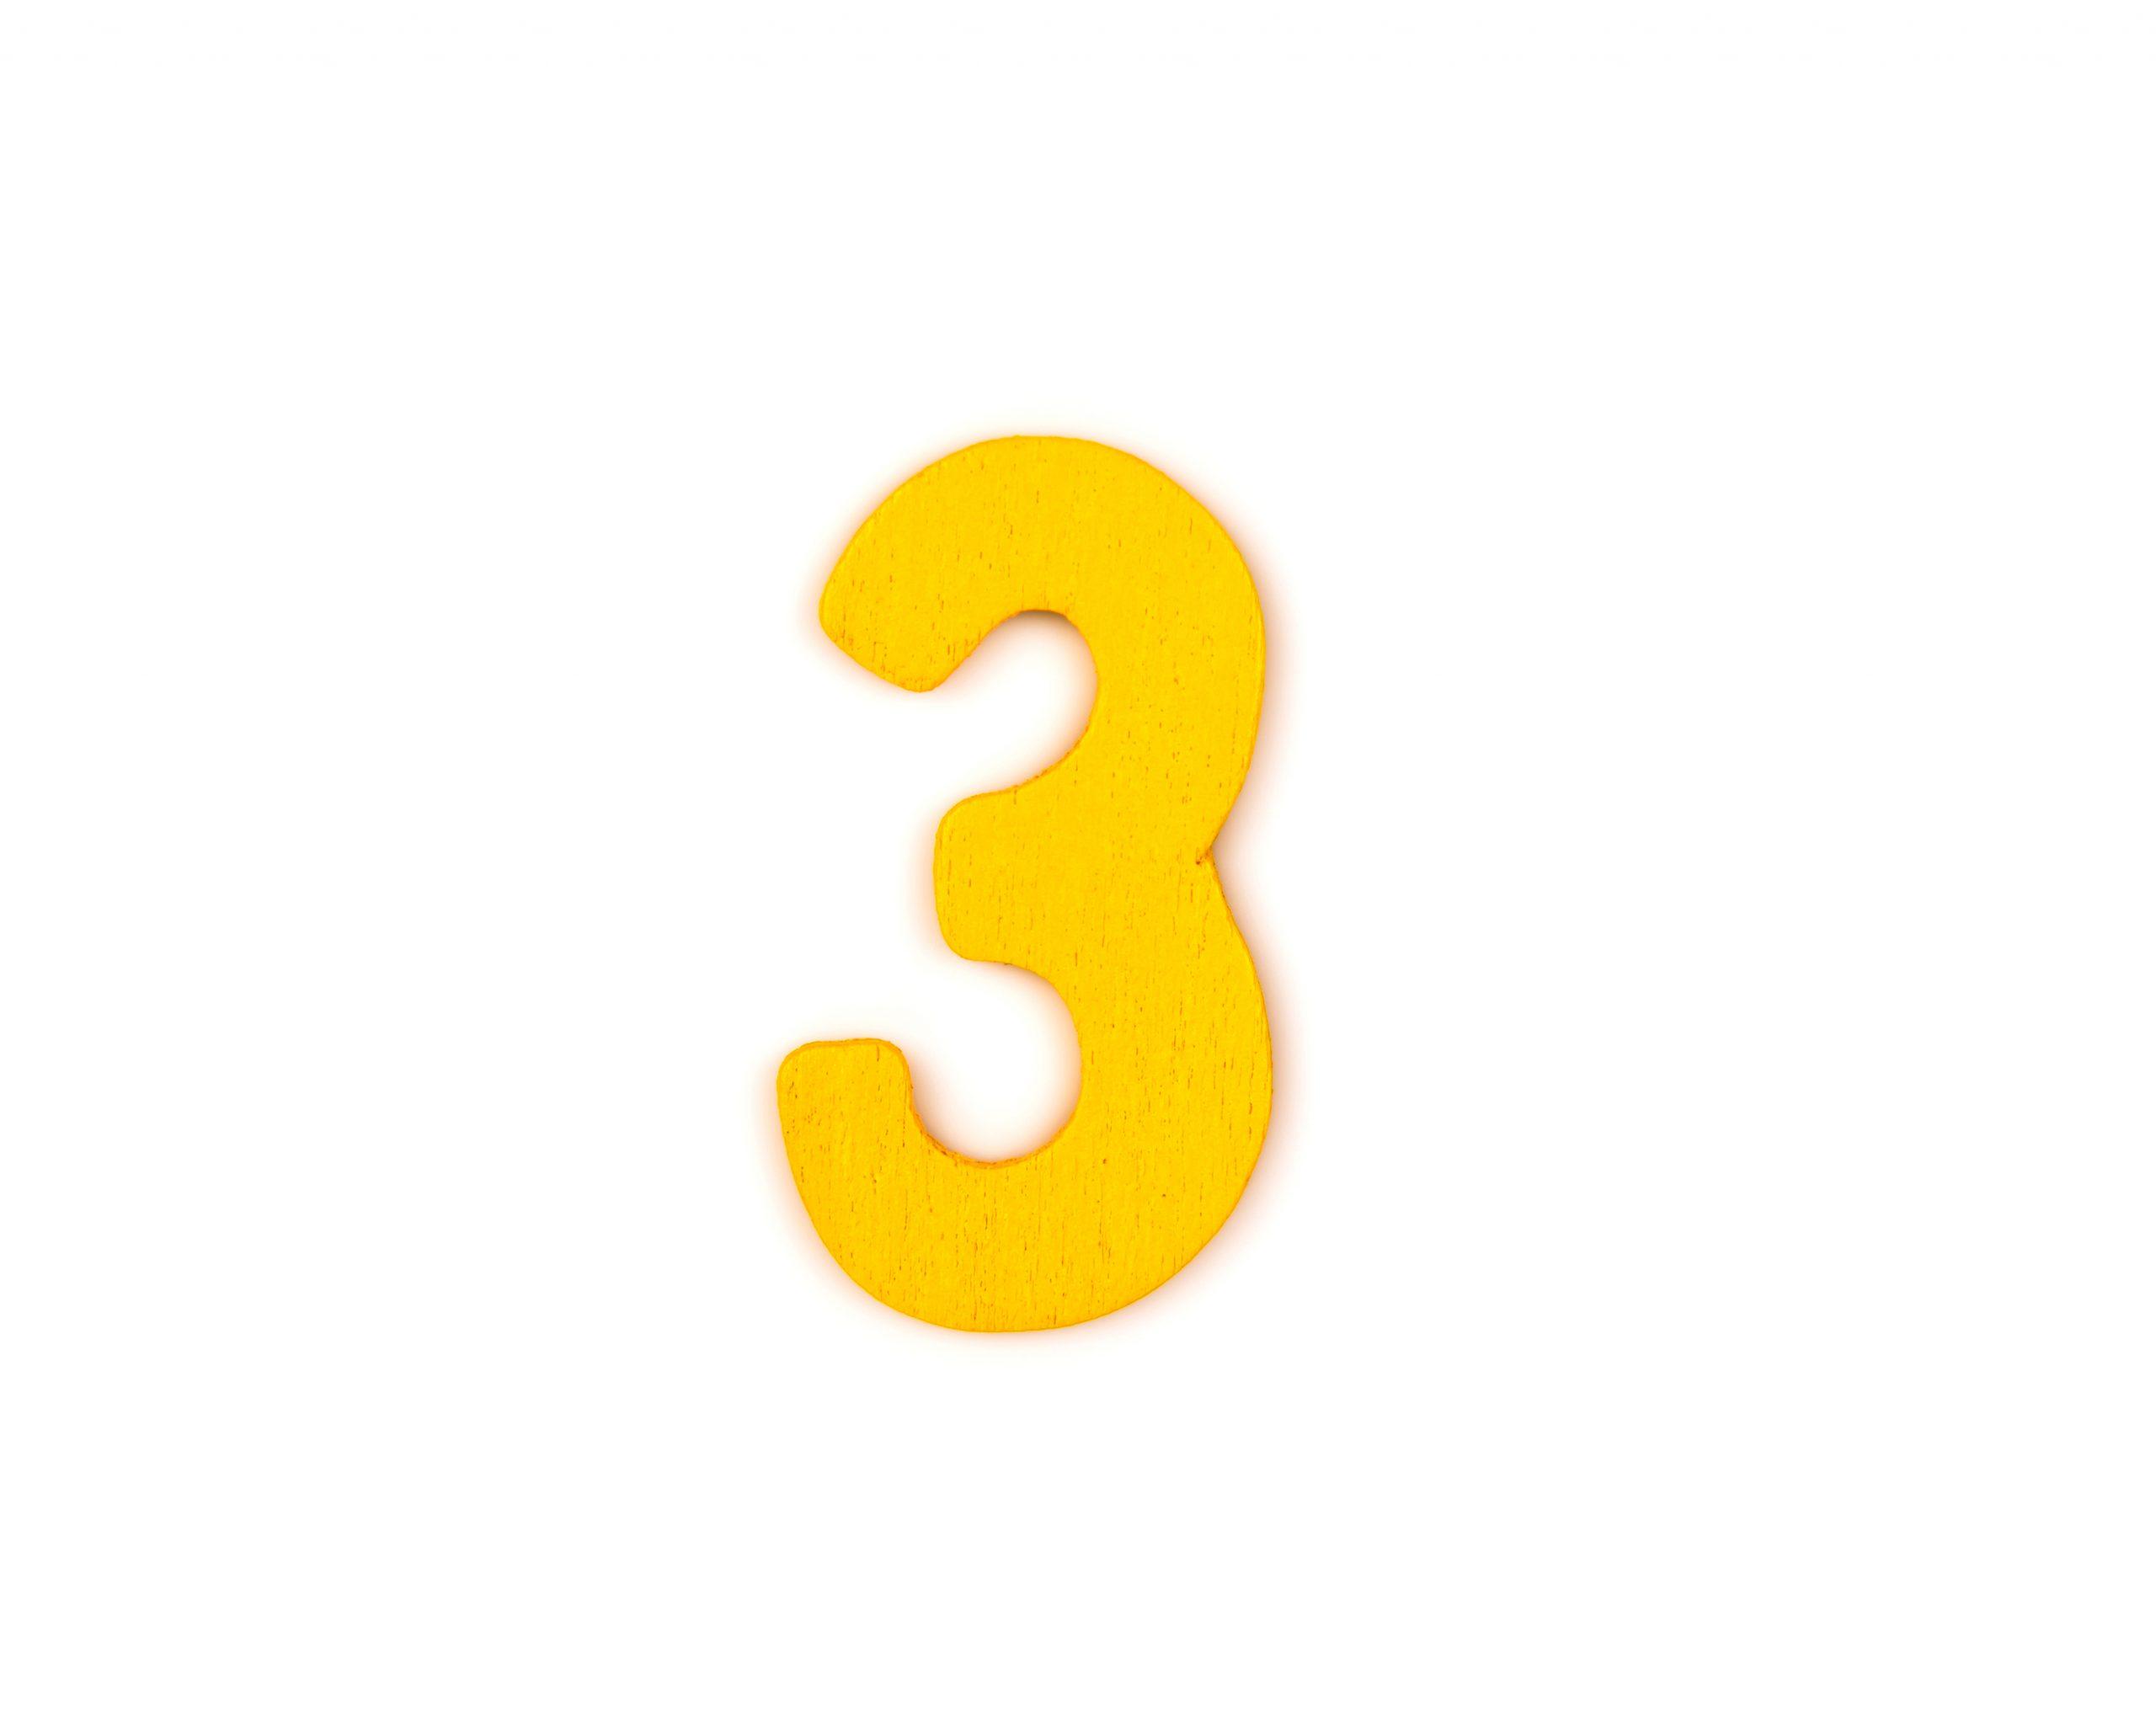 3 raisons